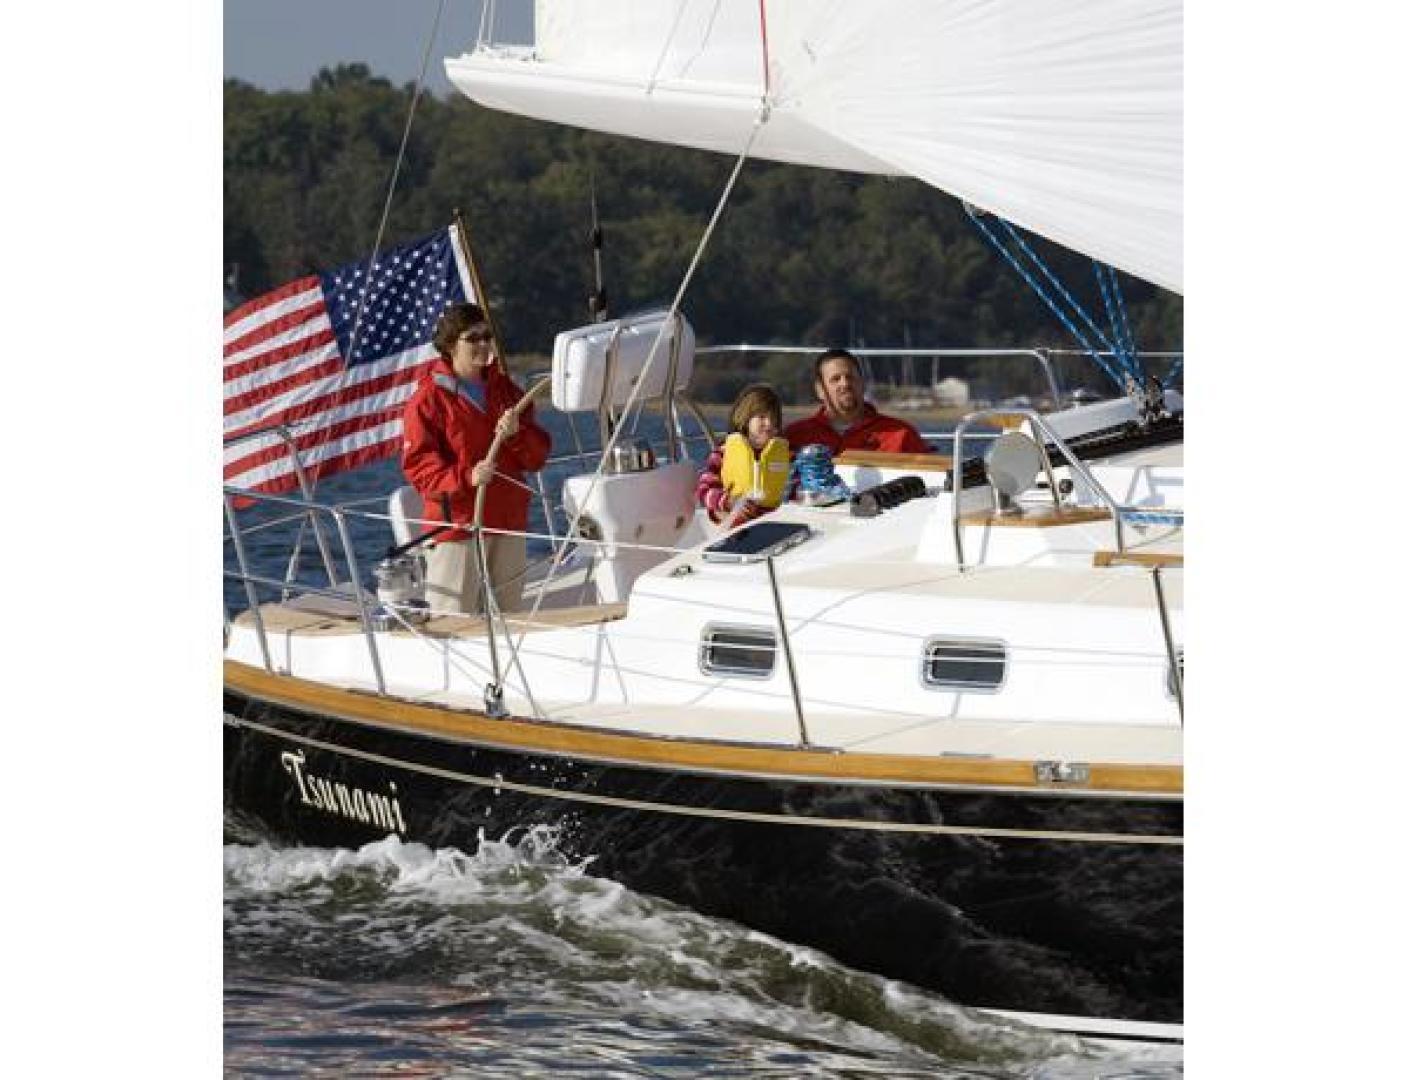 Tartan-4300 2021 -Anacortes-Washington-United States-971997   Thumbnail